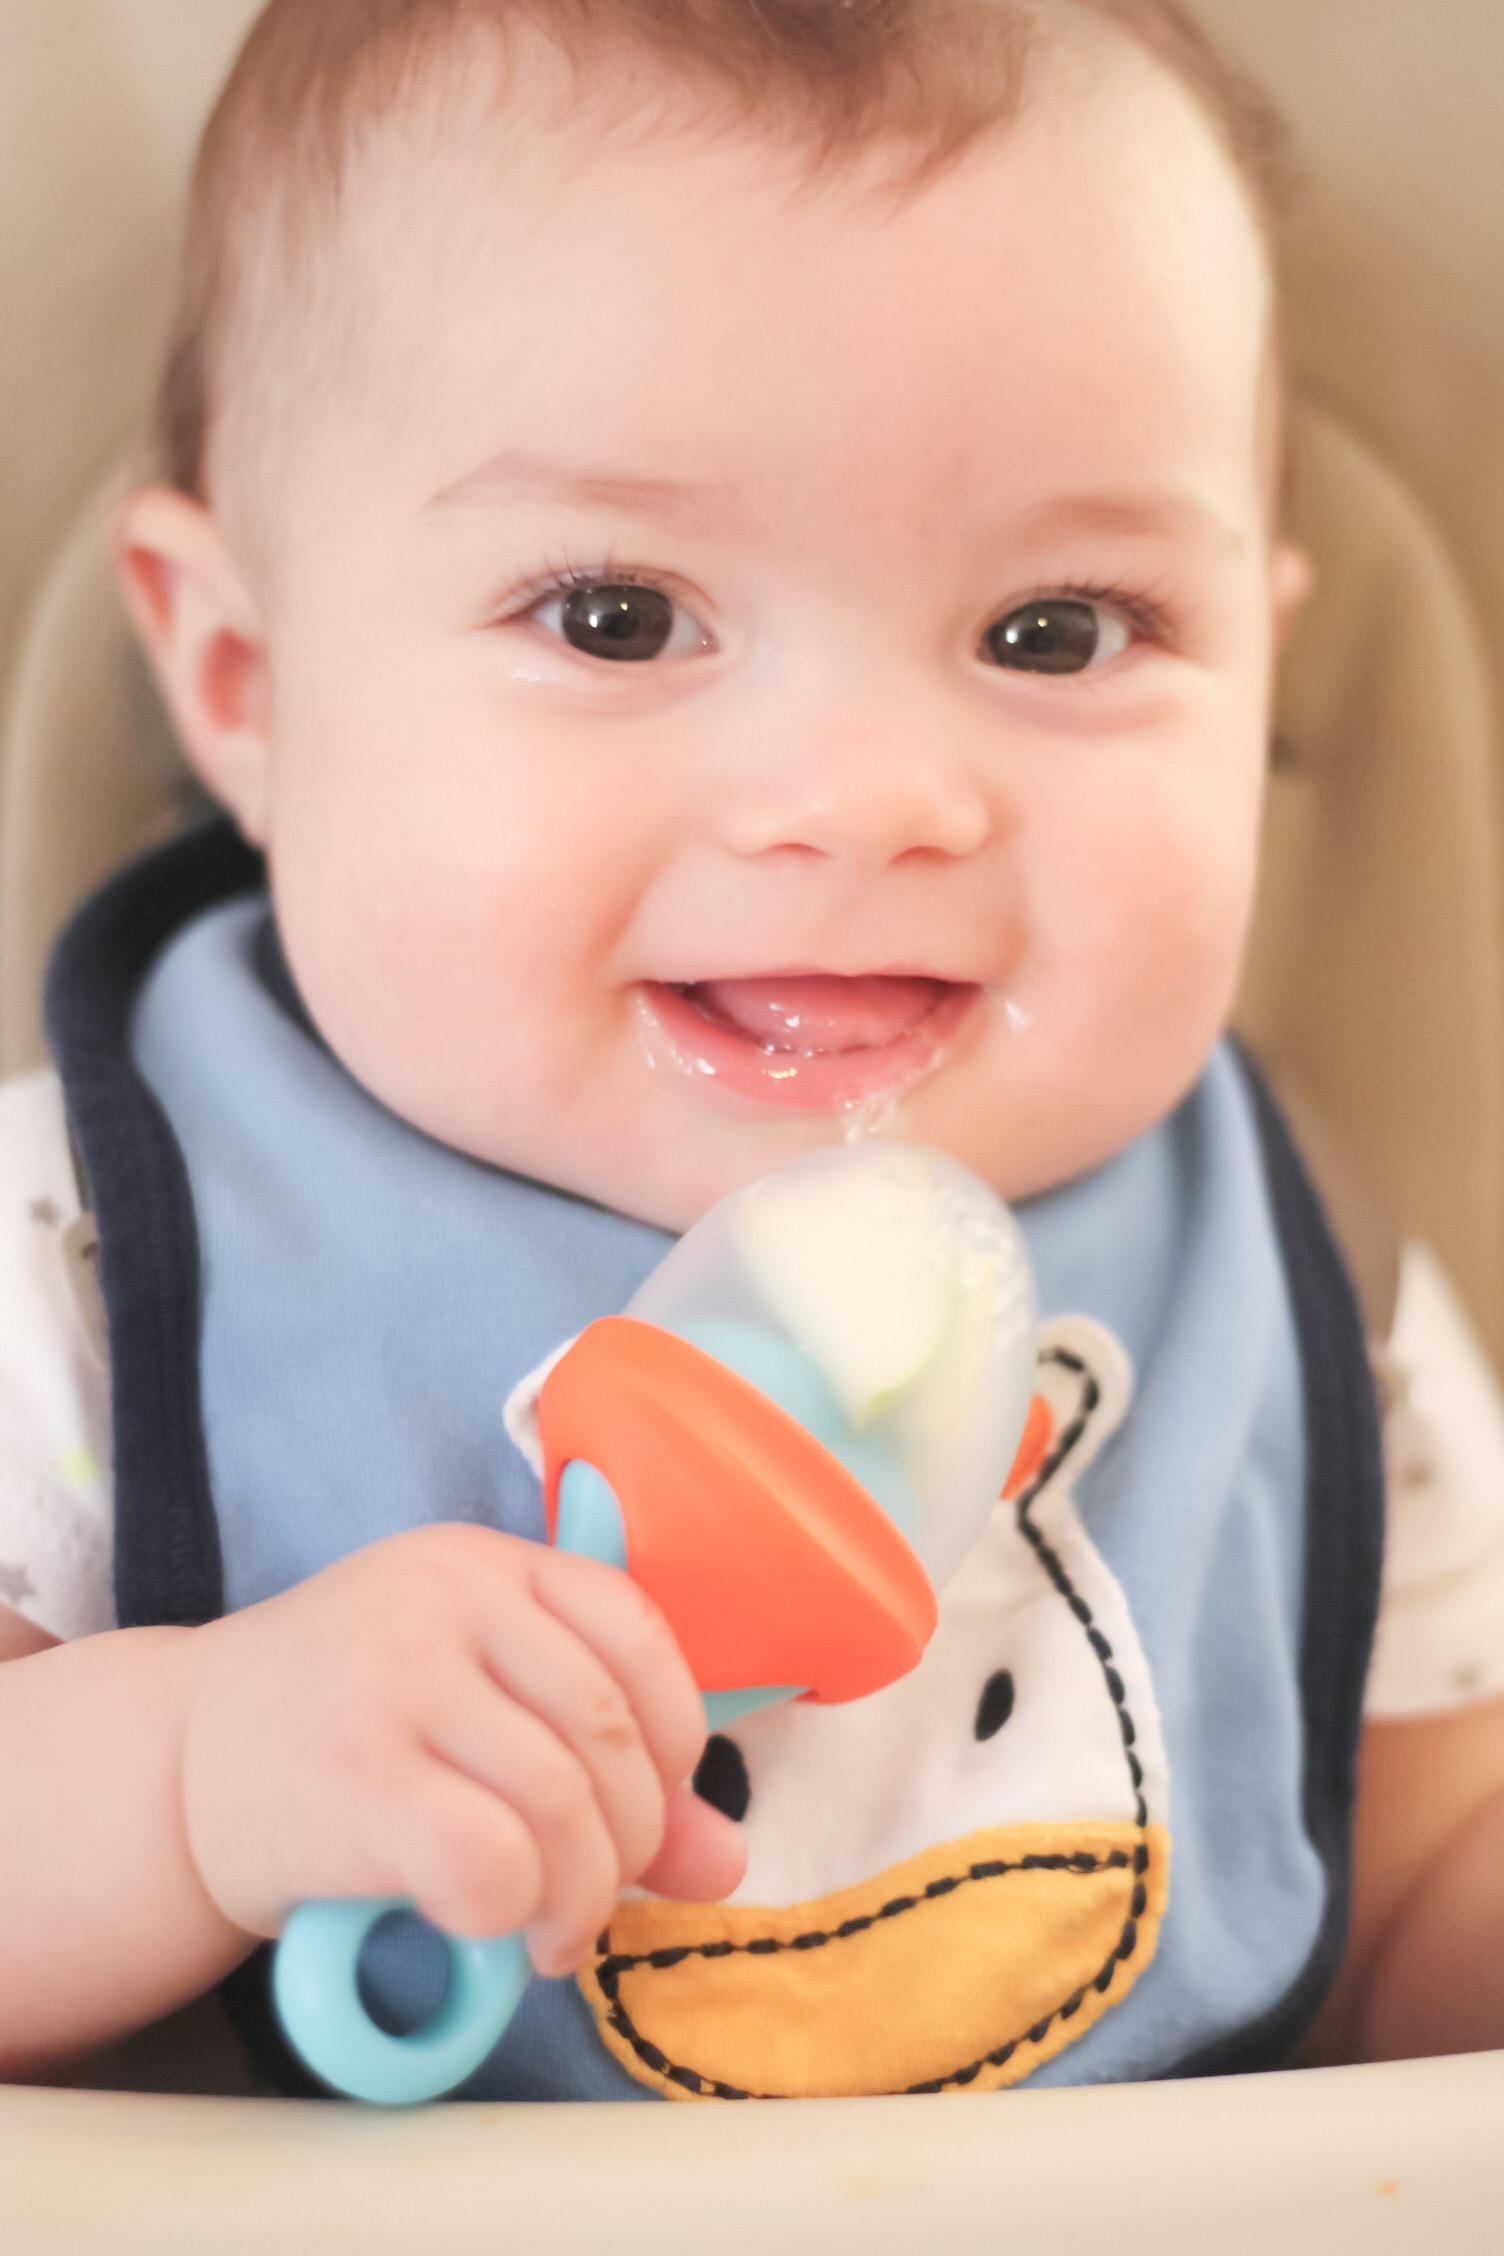 Using Frozen Breast Milk To Make Baby Food